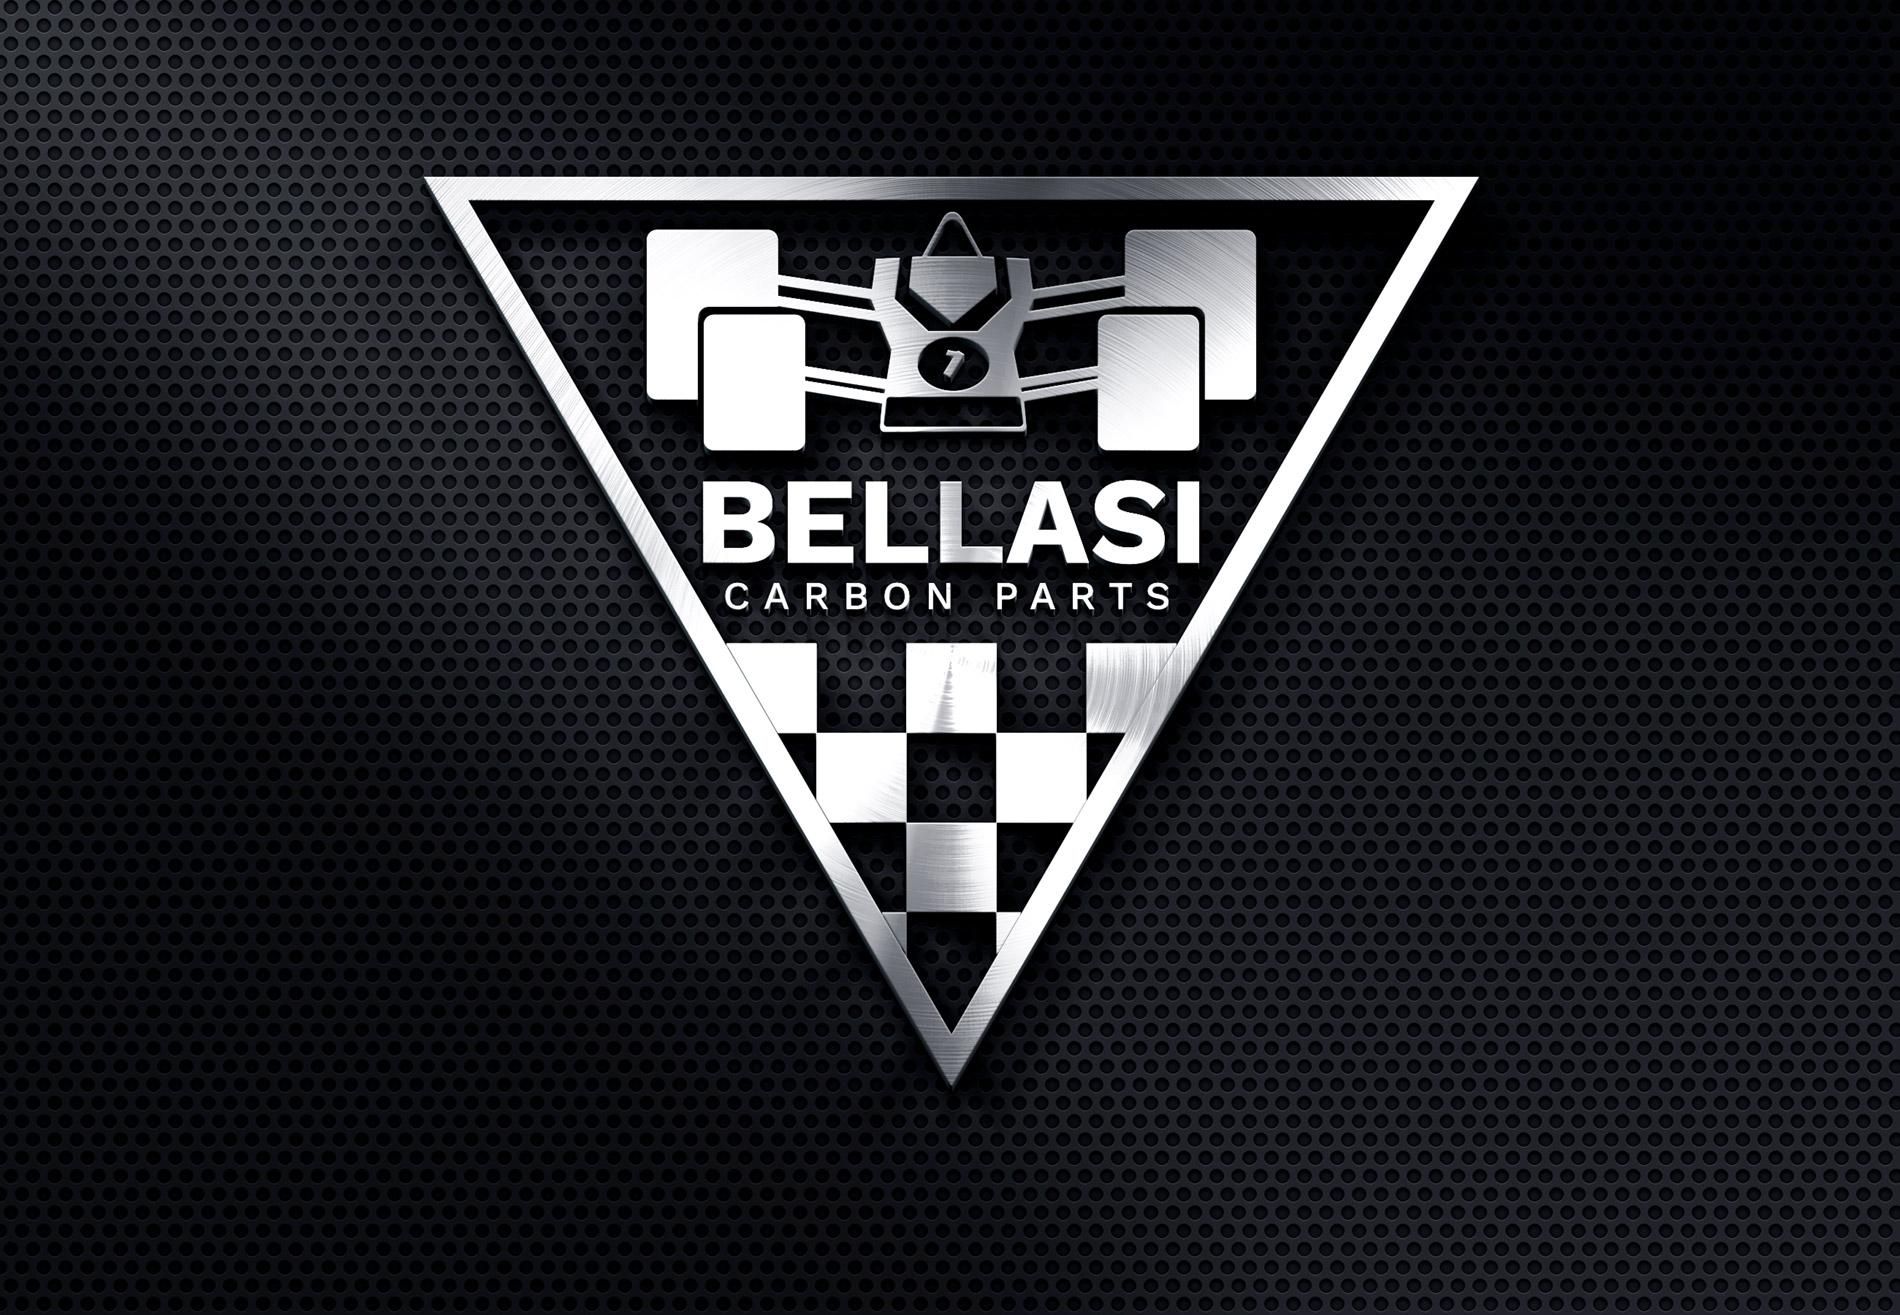 bellasi_new_logo